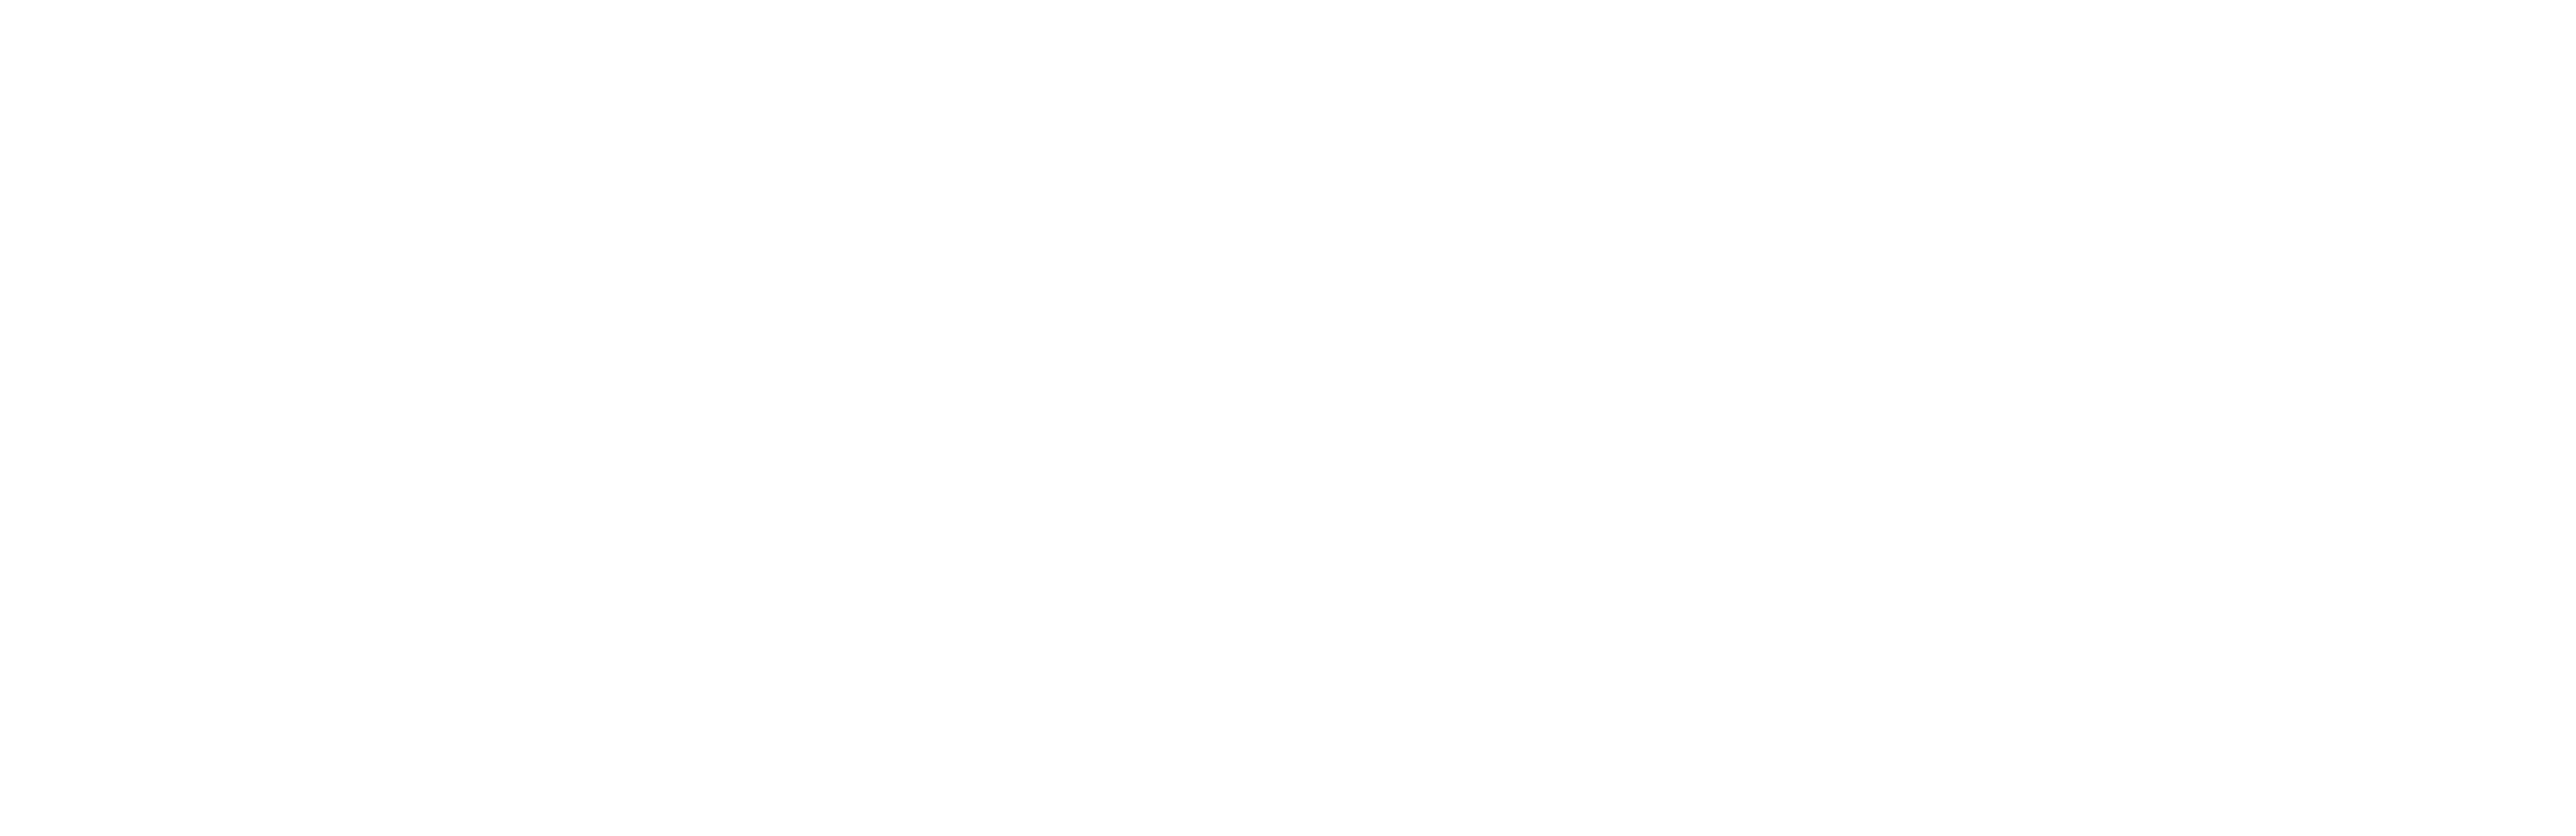 Trung Tâm Anh Ngữ Action English